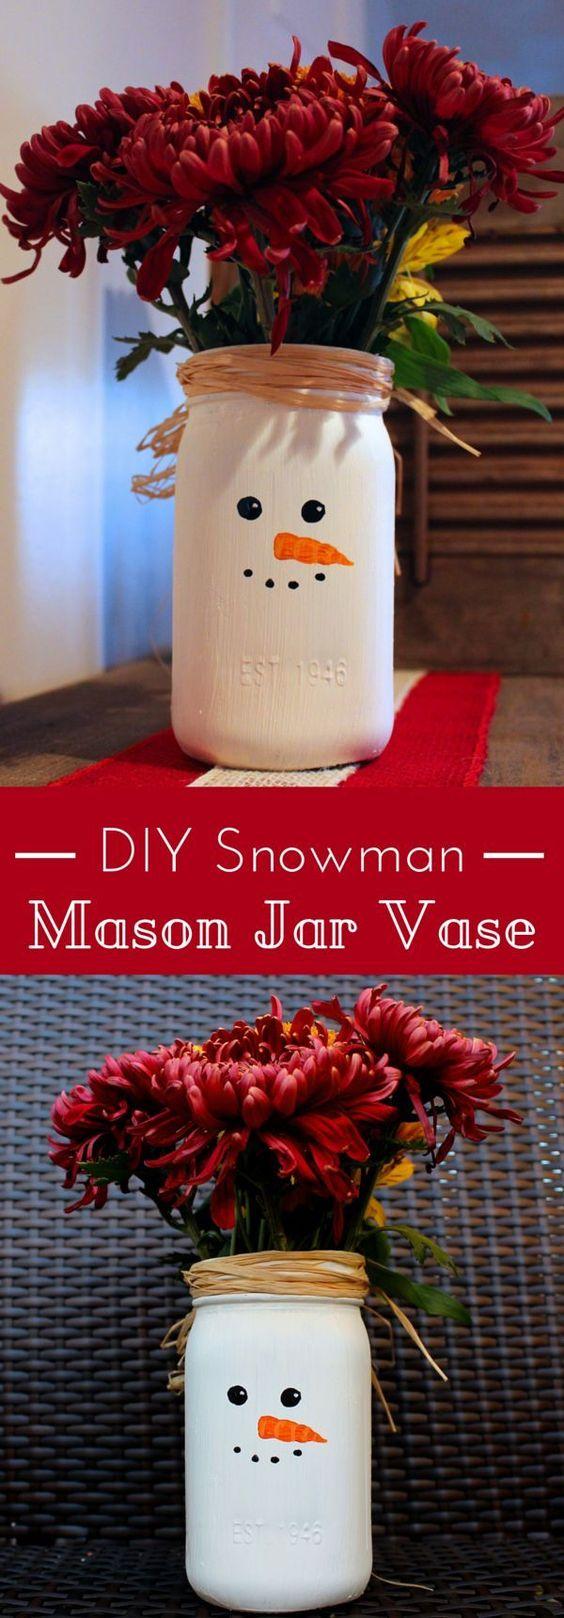 15 Mason Jar Crafts you can do today!